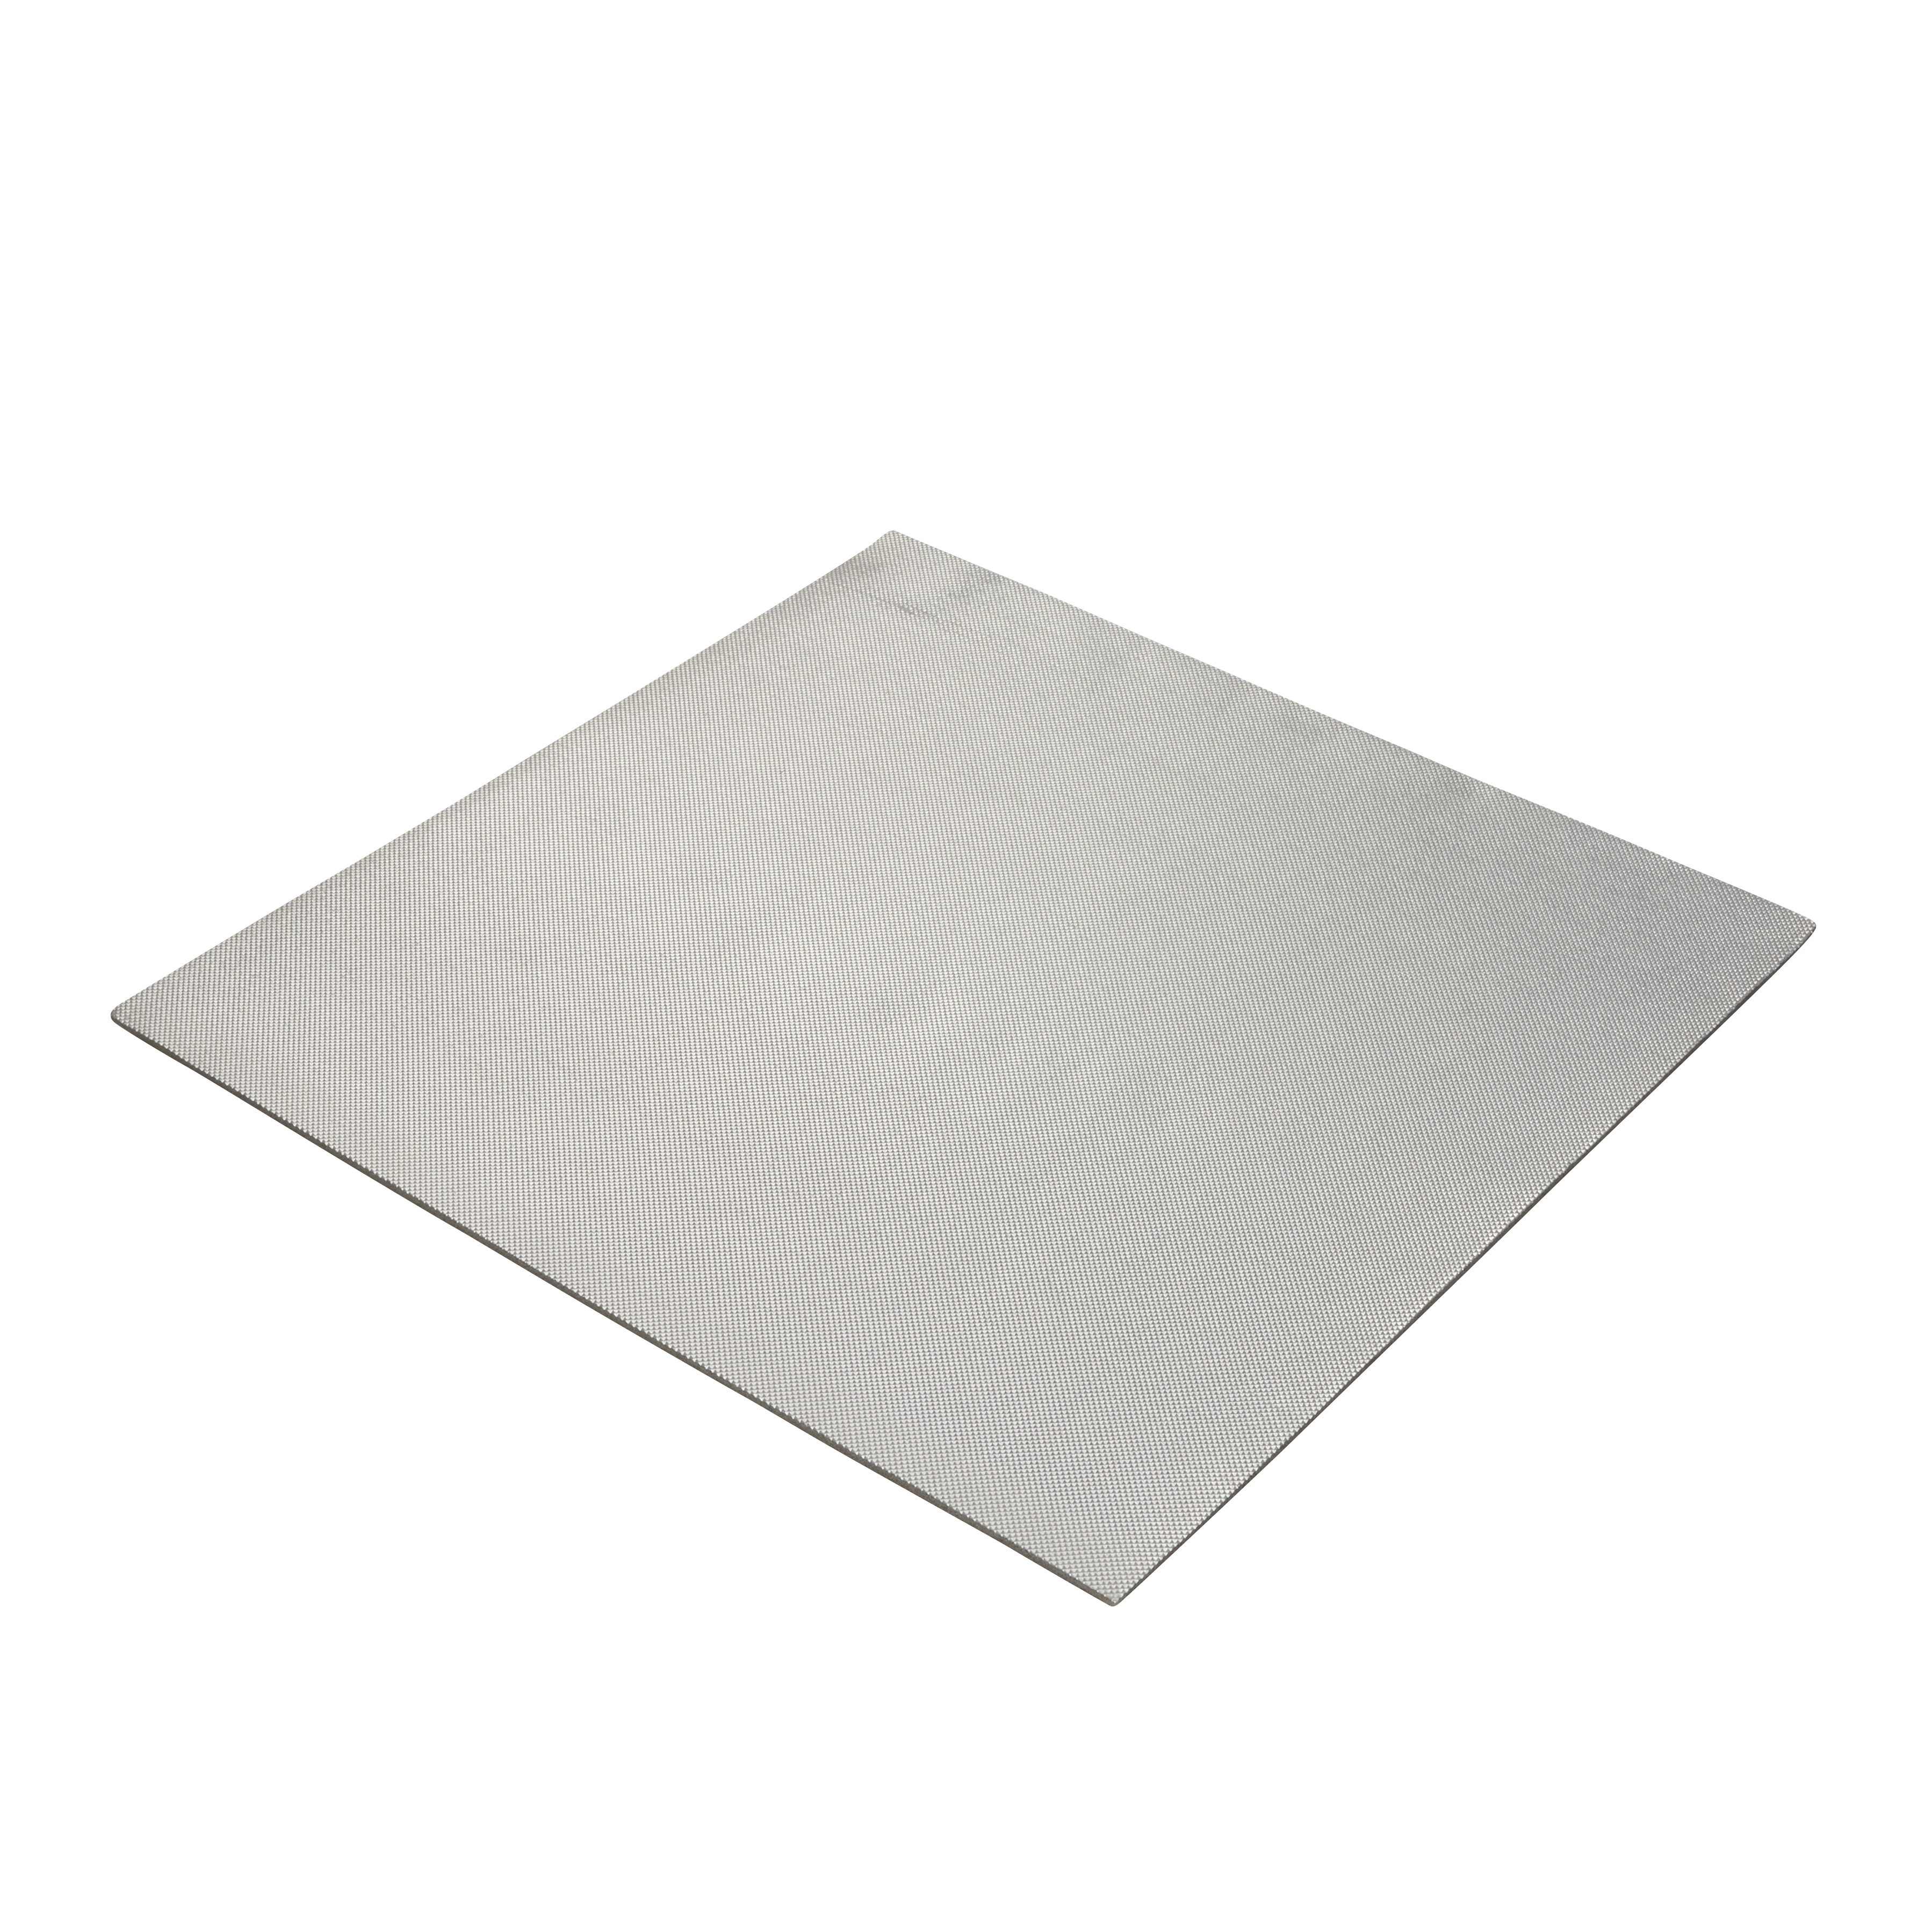 Strange Diall Thermal Self Adhesive Foam Garage Insulation Tile L 500Mm W 500Mm T 5Mm Pack Of 20 Departments Diy At Bq Creativecarmelina Interior Chair Design Creativecarmelinacom